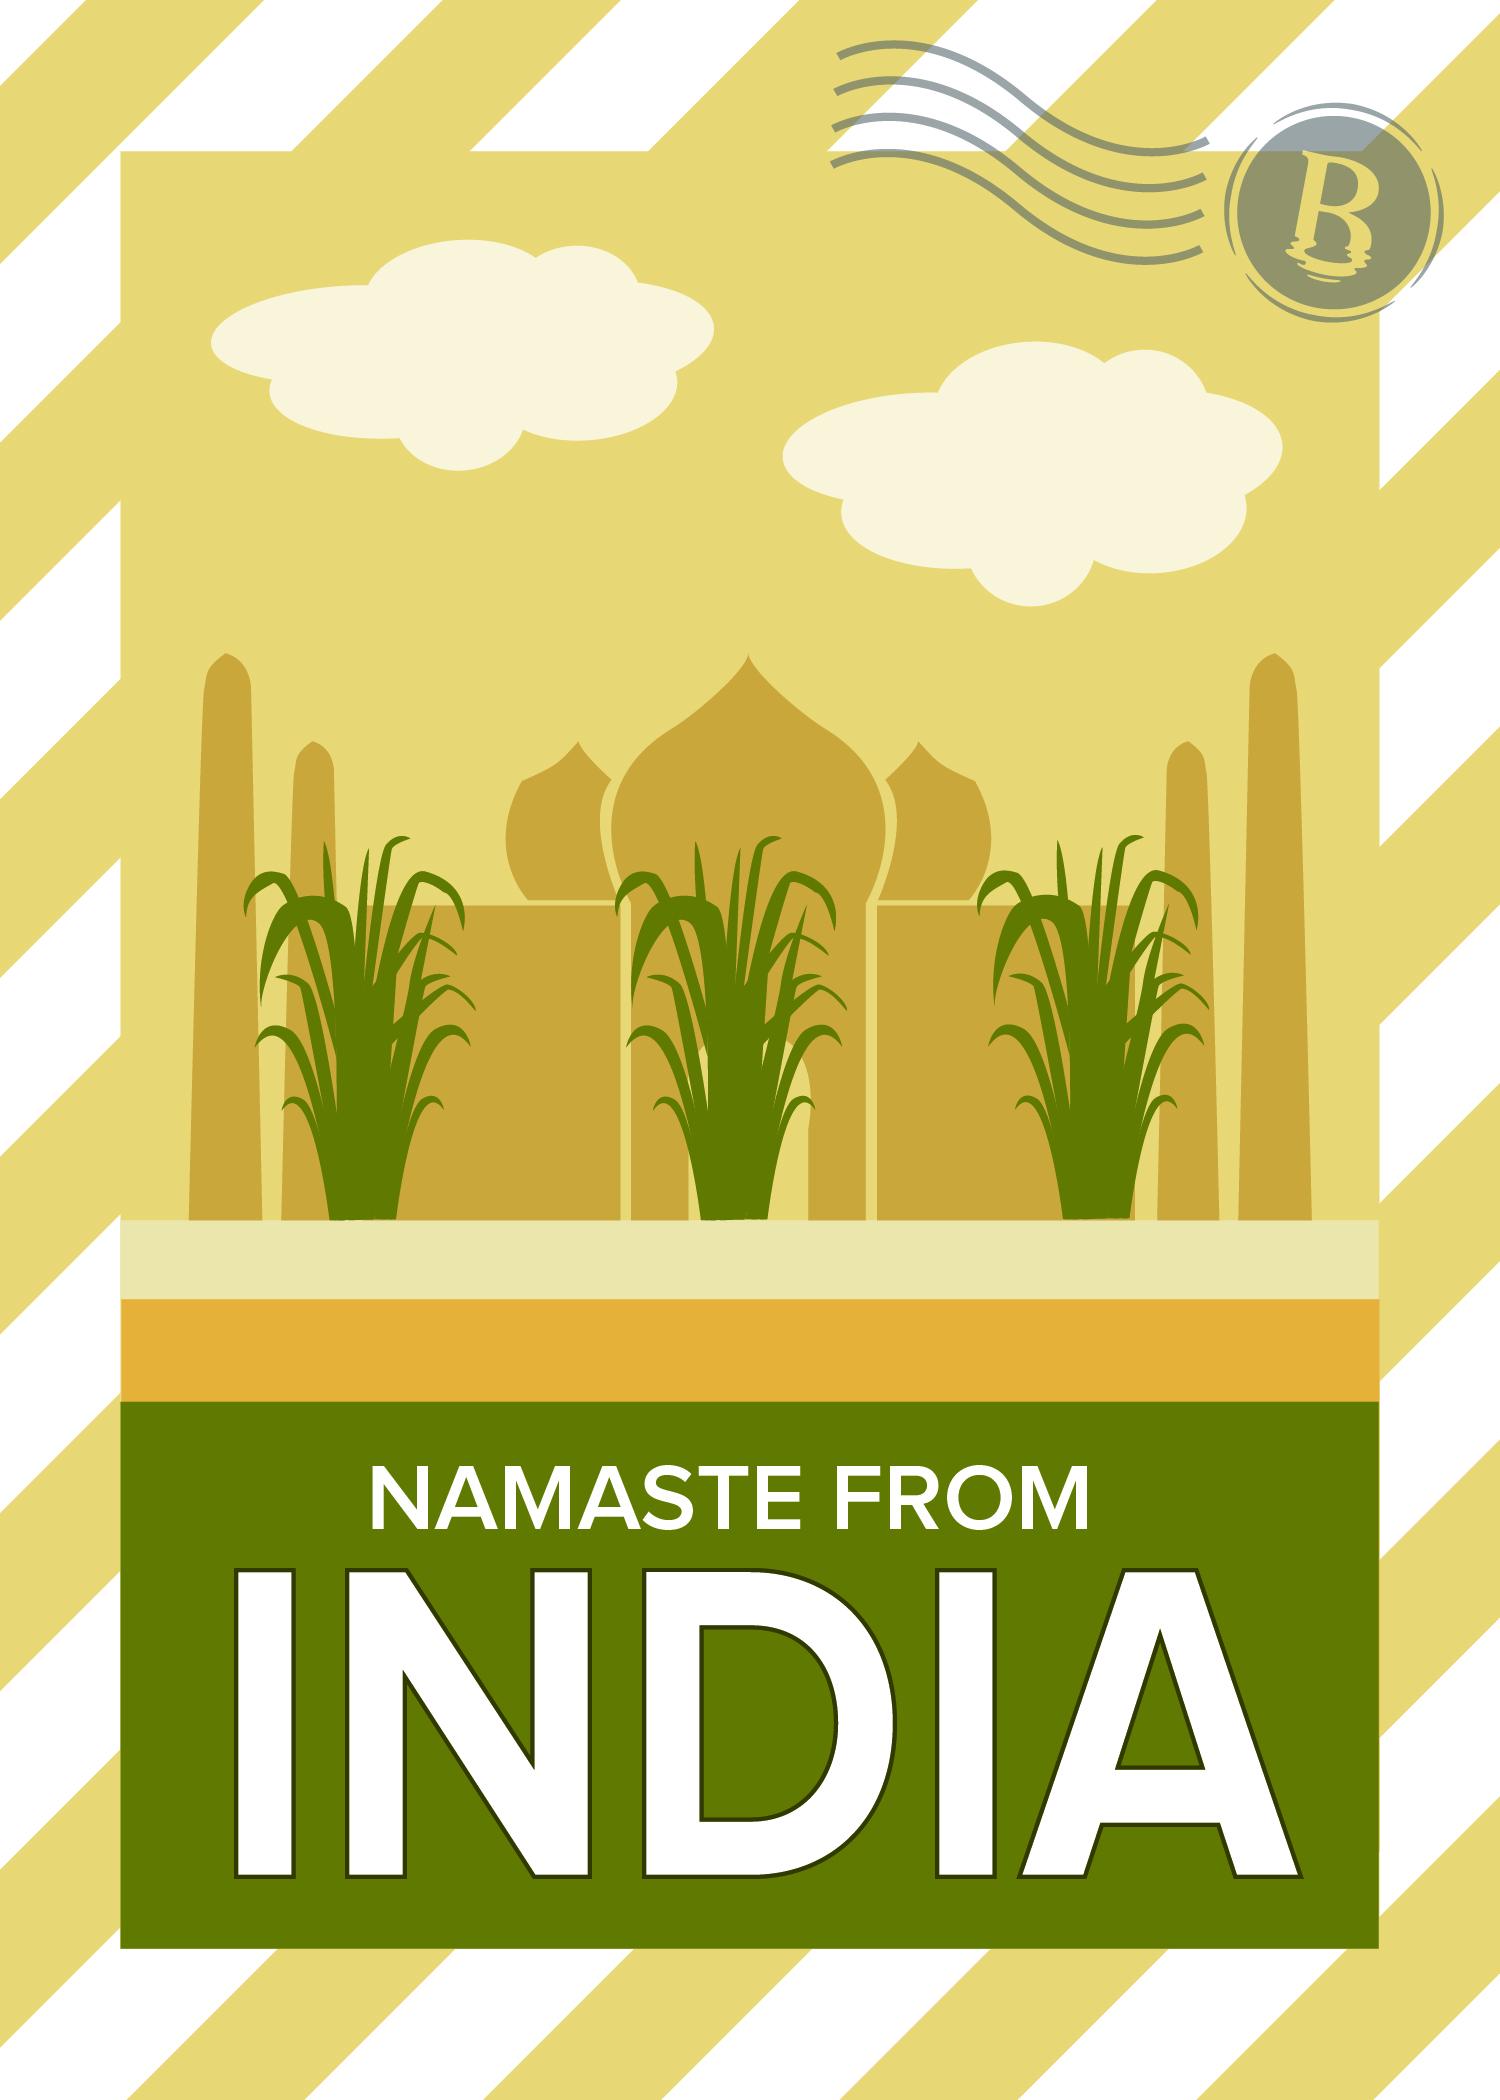 IndiaPostcard